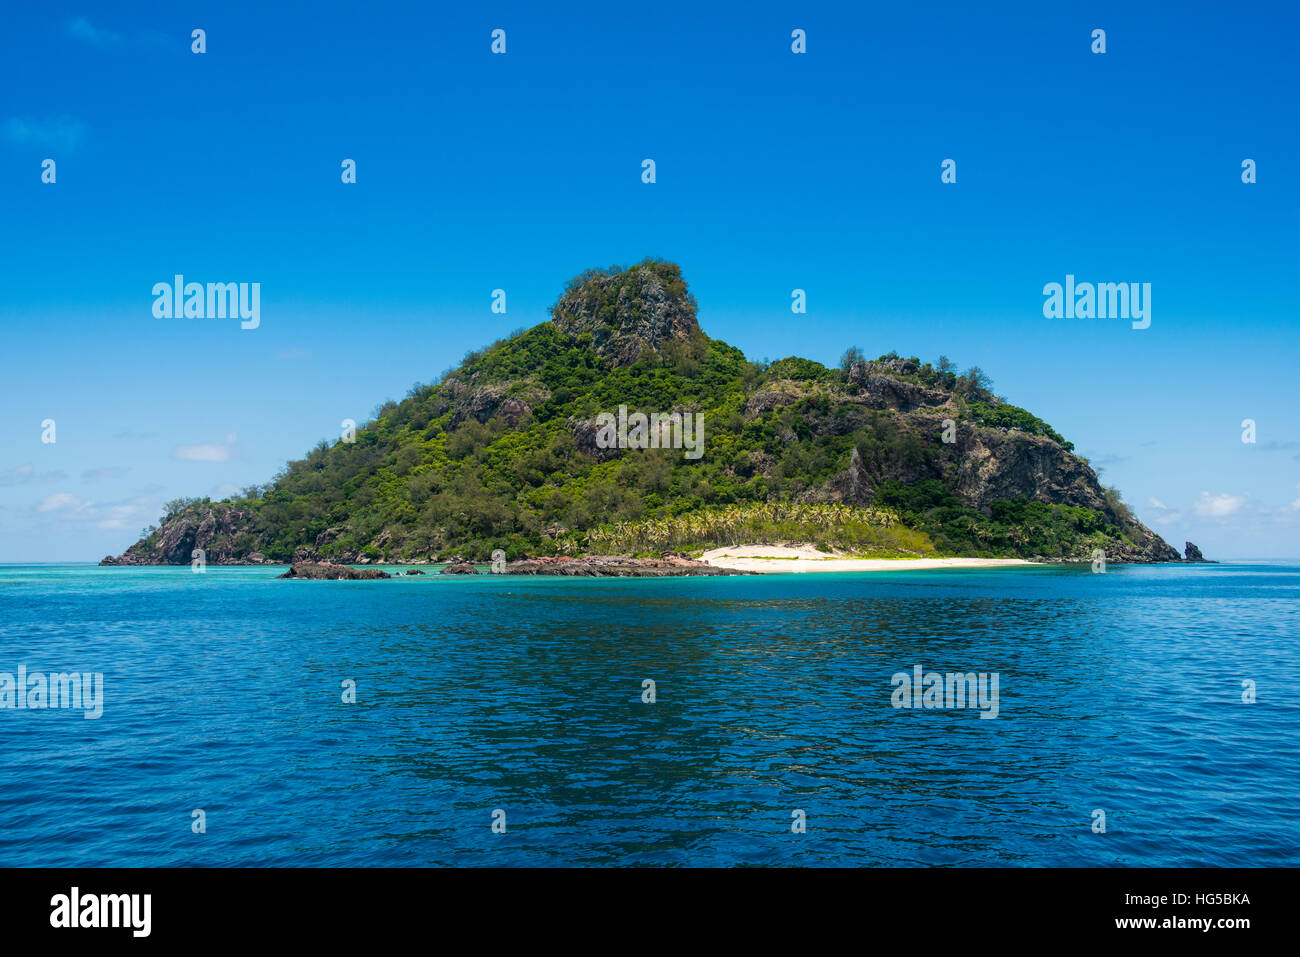 Monuriki (Cast Away Insel), Mamanuca Inseln, Fidschi, Südpazifik Stockbild